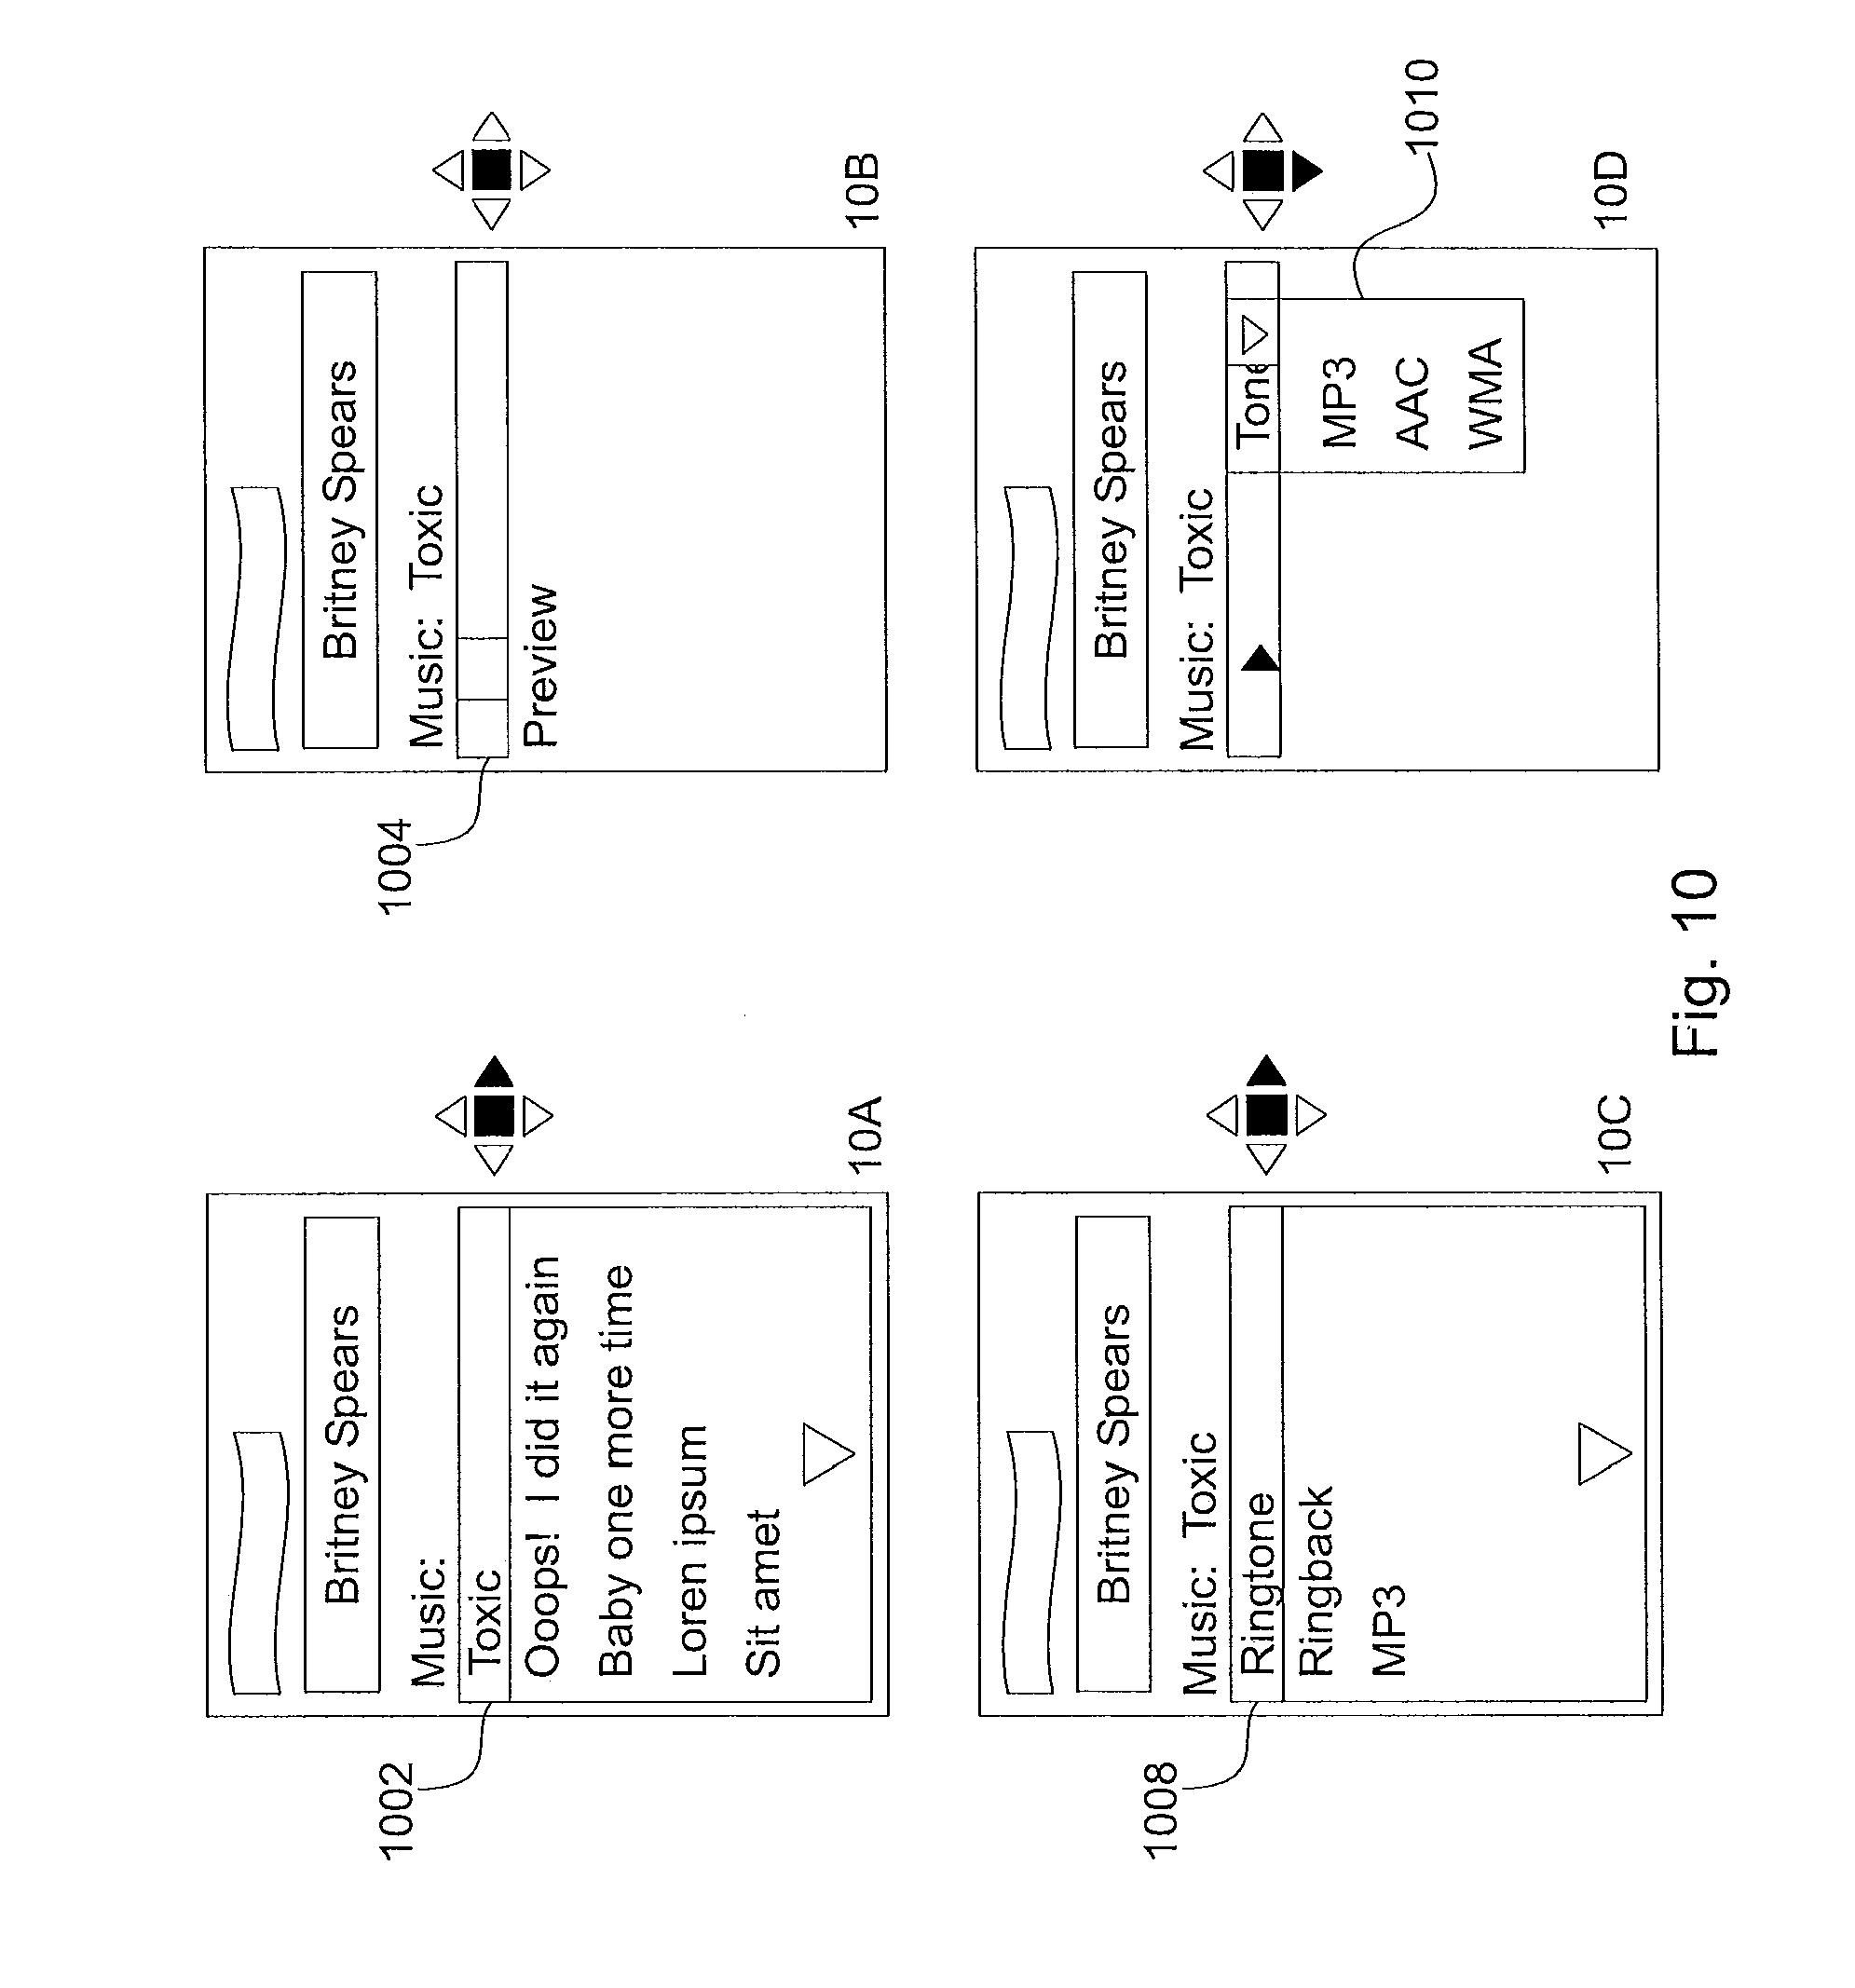 Patent Us20120179563 System For Retrieving Mobile Communication Ups Circuit Diagram Urdu Drawing